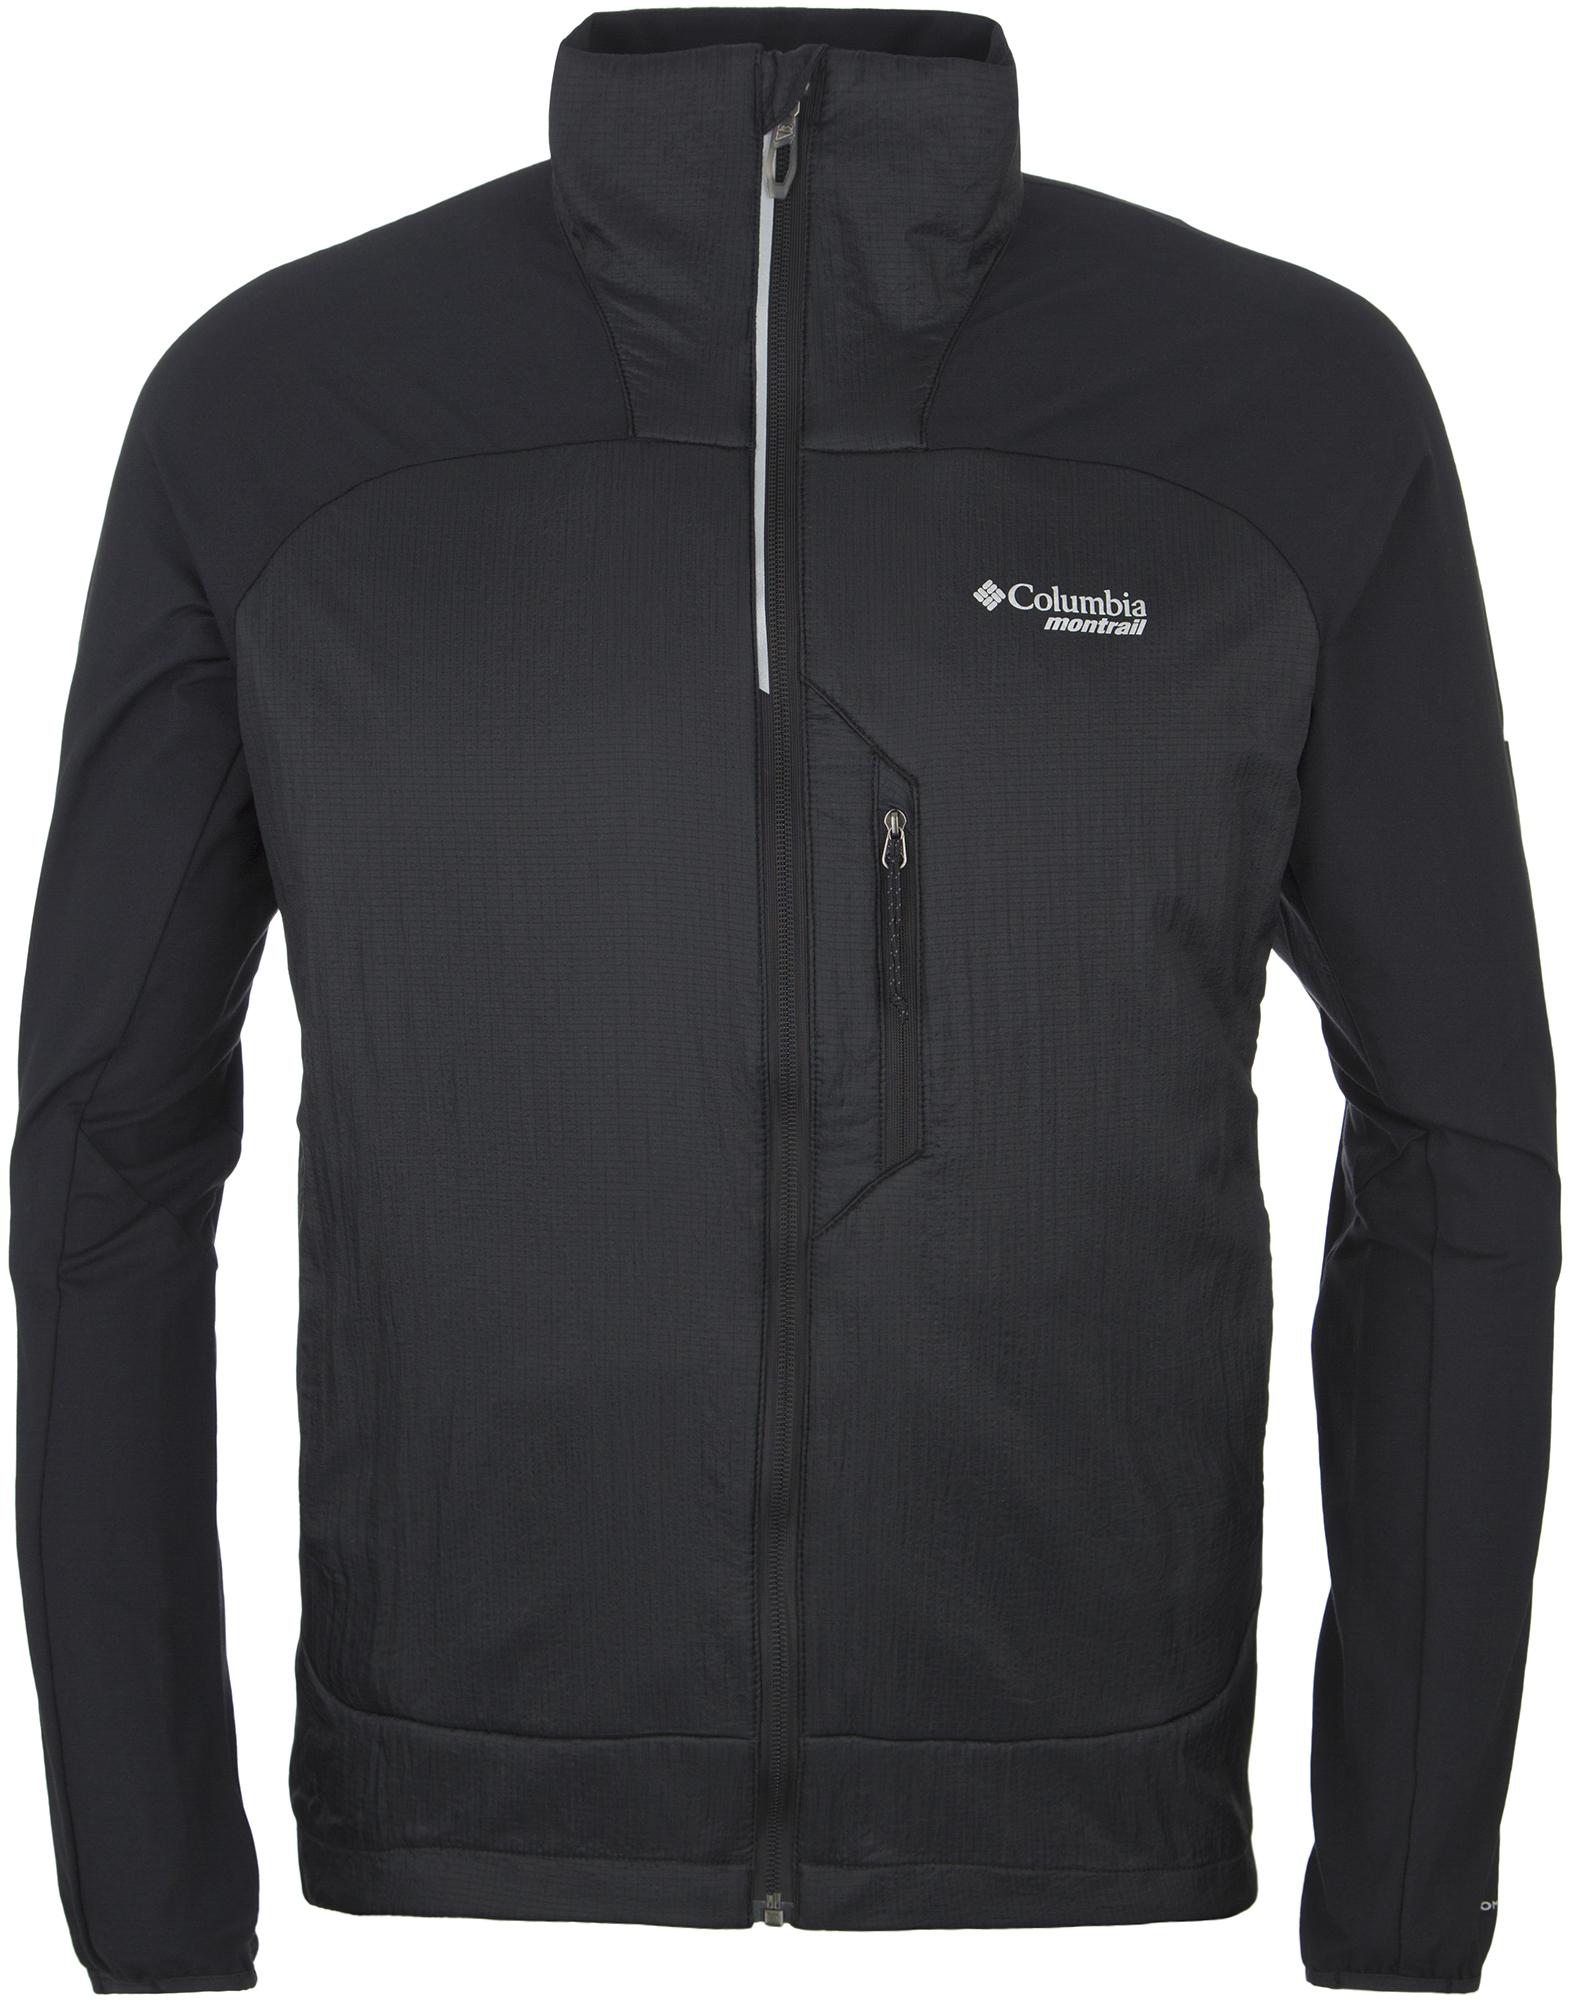 Columbia Куртка утепленная мужская Columbia Caldorado III, размер 54